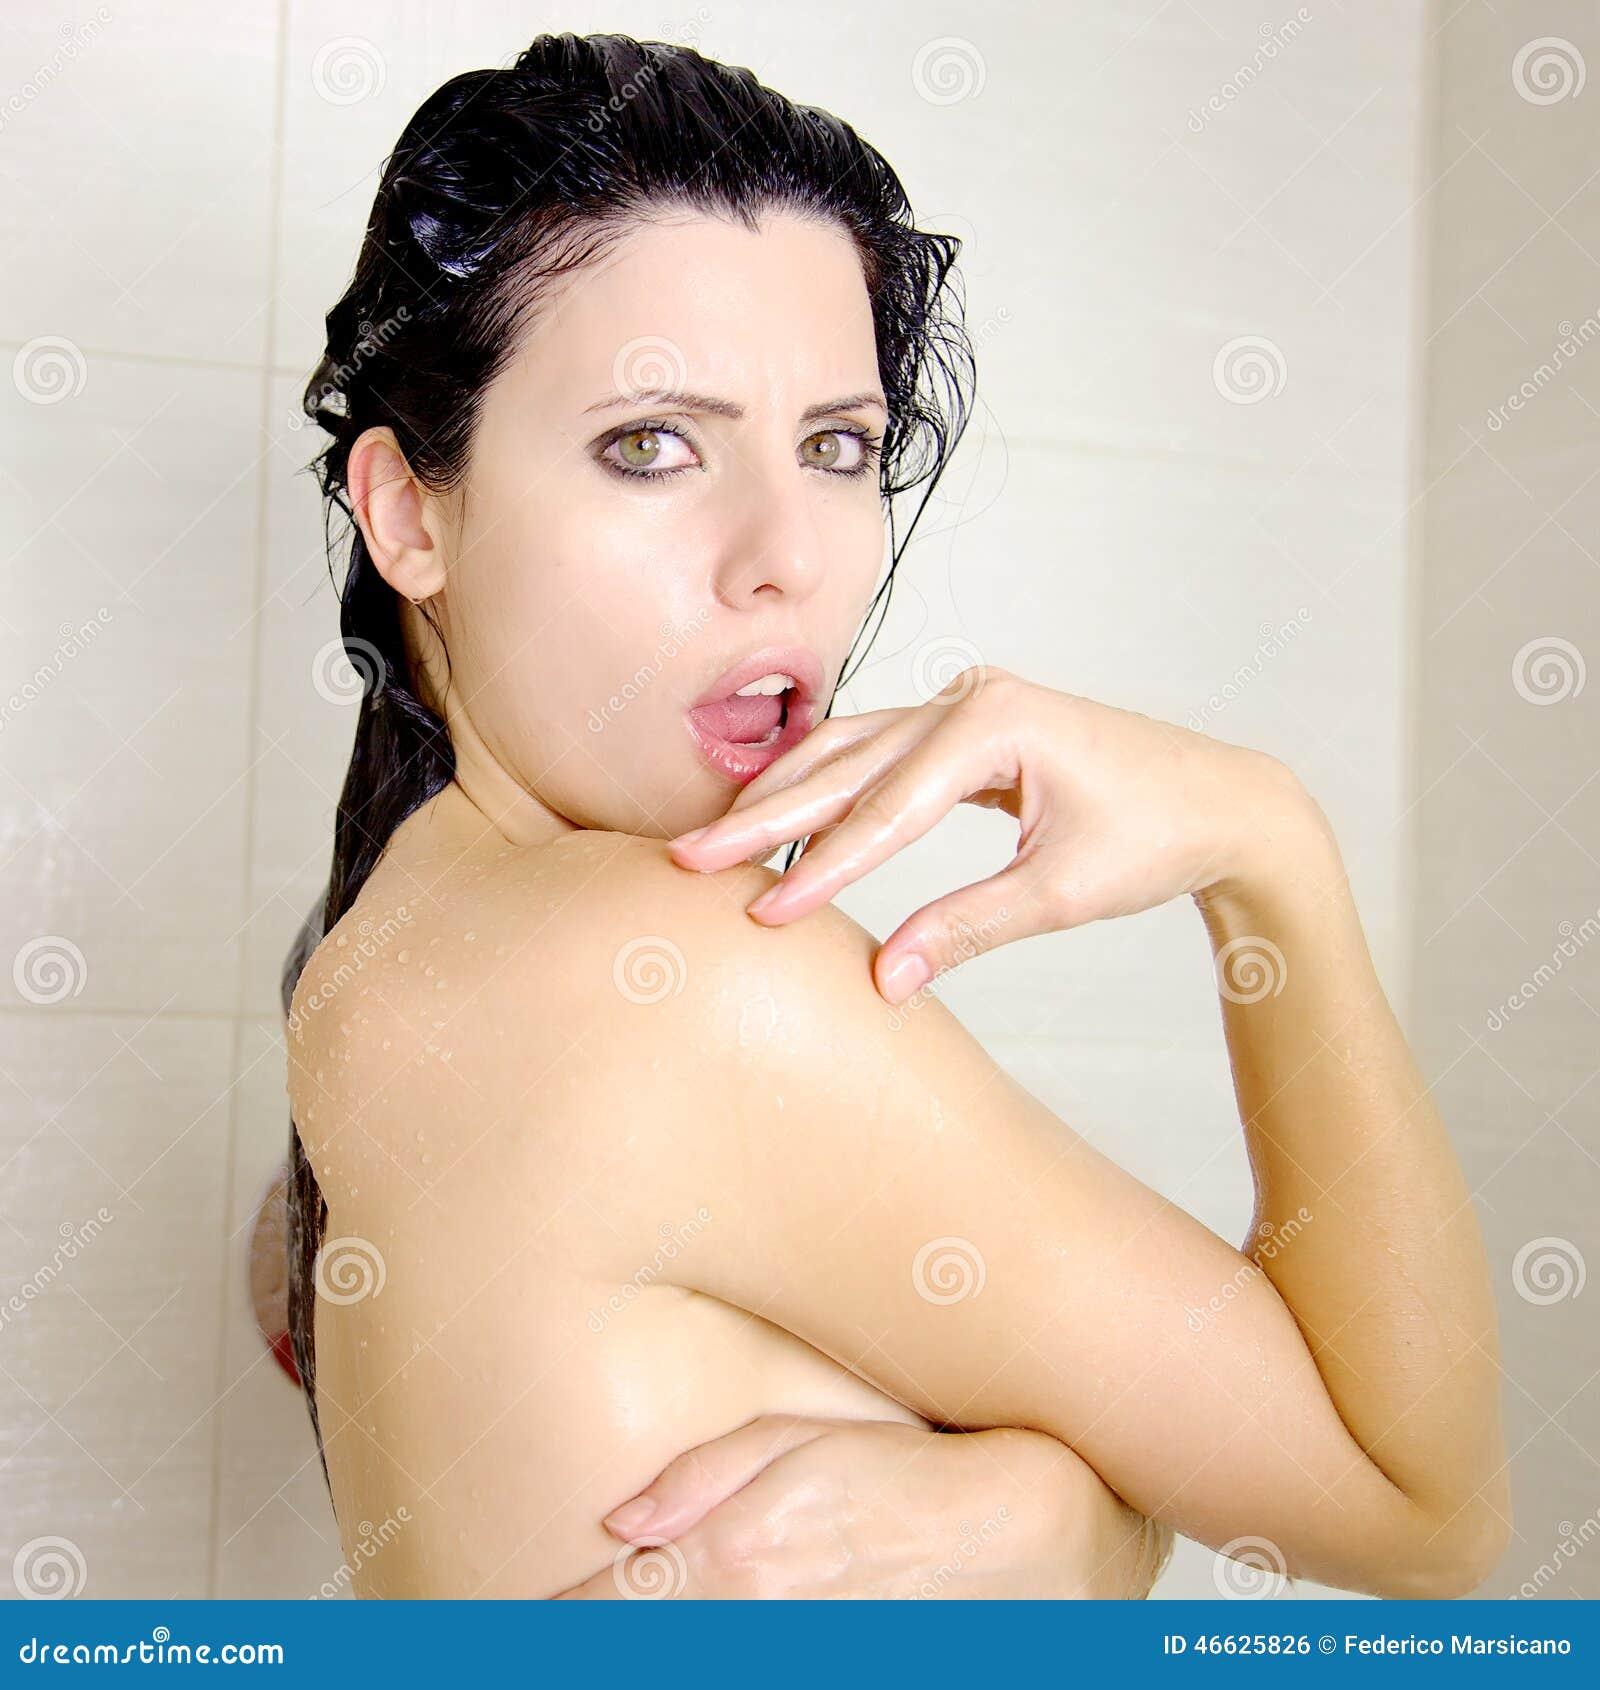 xxx hottest naked girl